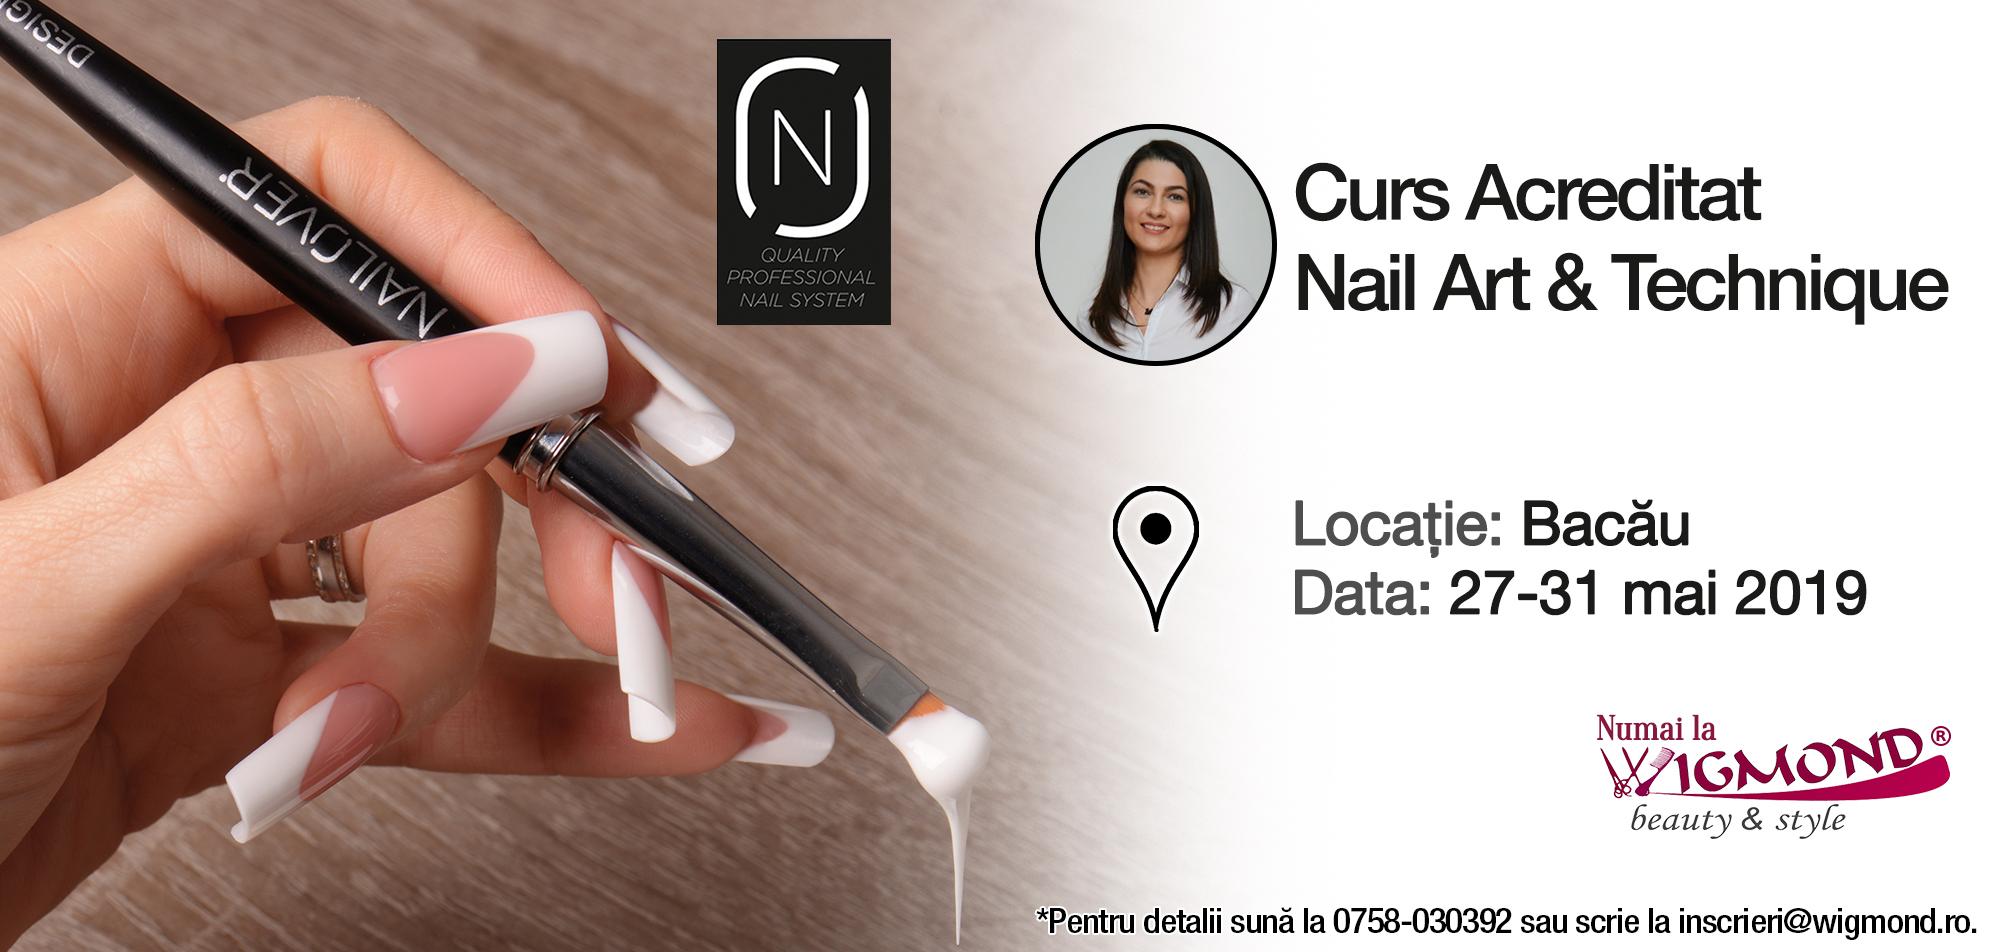 Cursul acreditat nail art Nailover 27-31 mai 2019